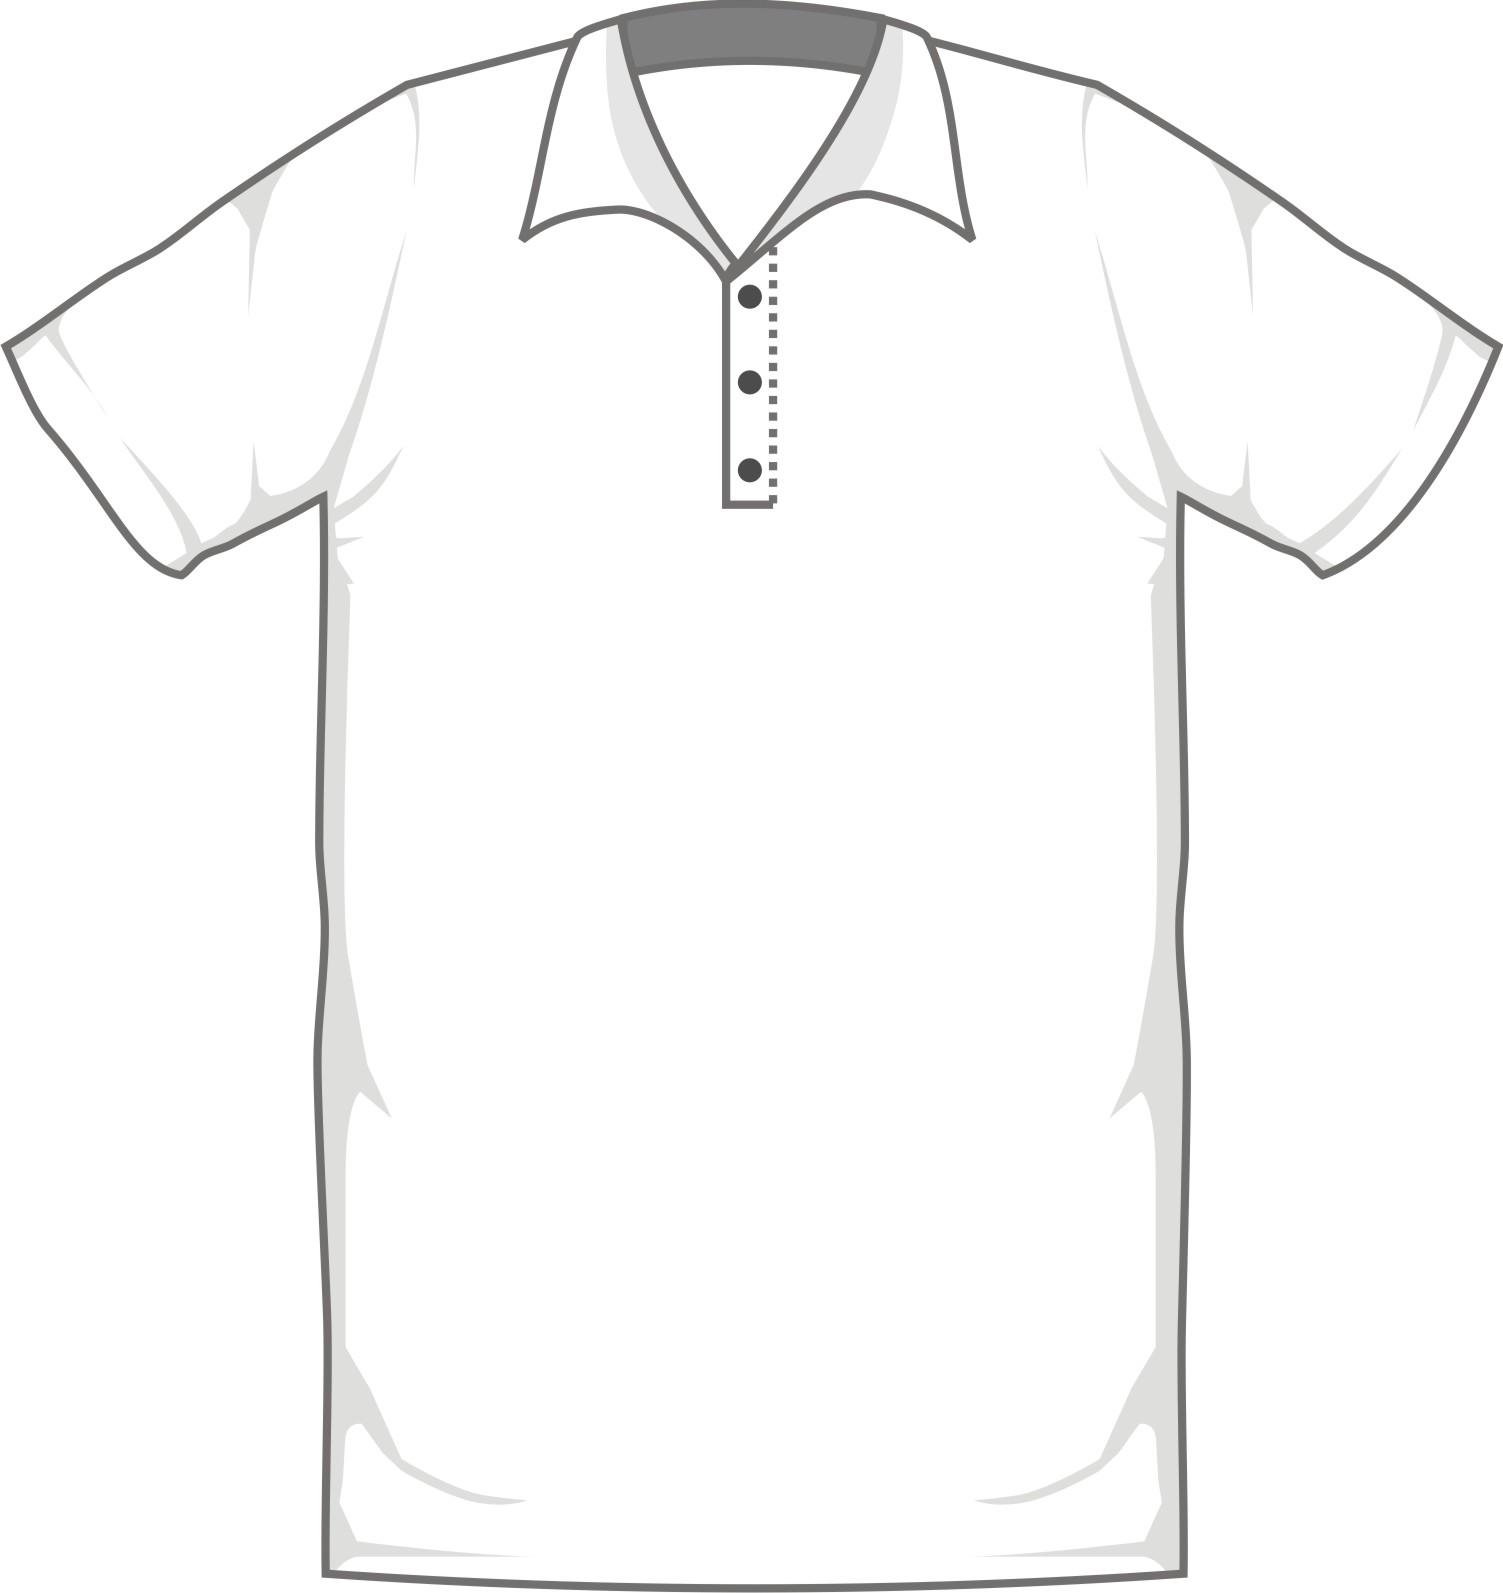 GURUNTOOLS: polo shirt templates